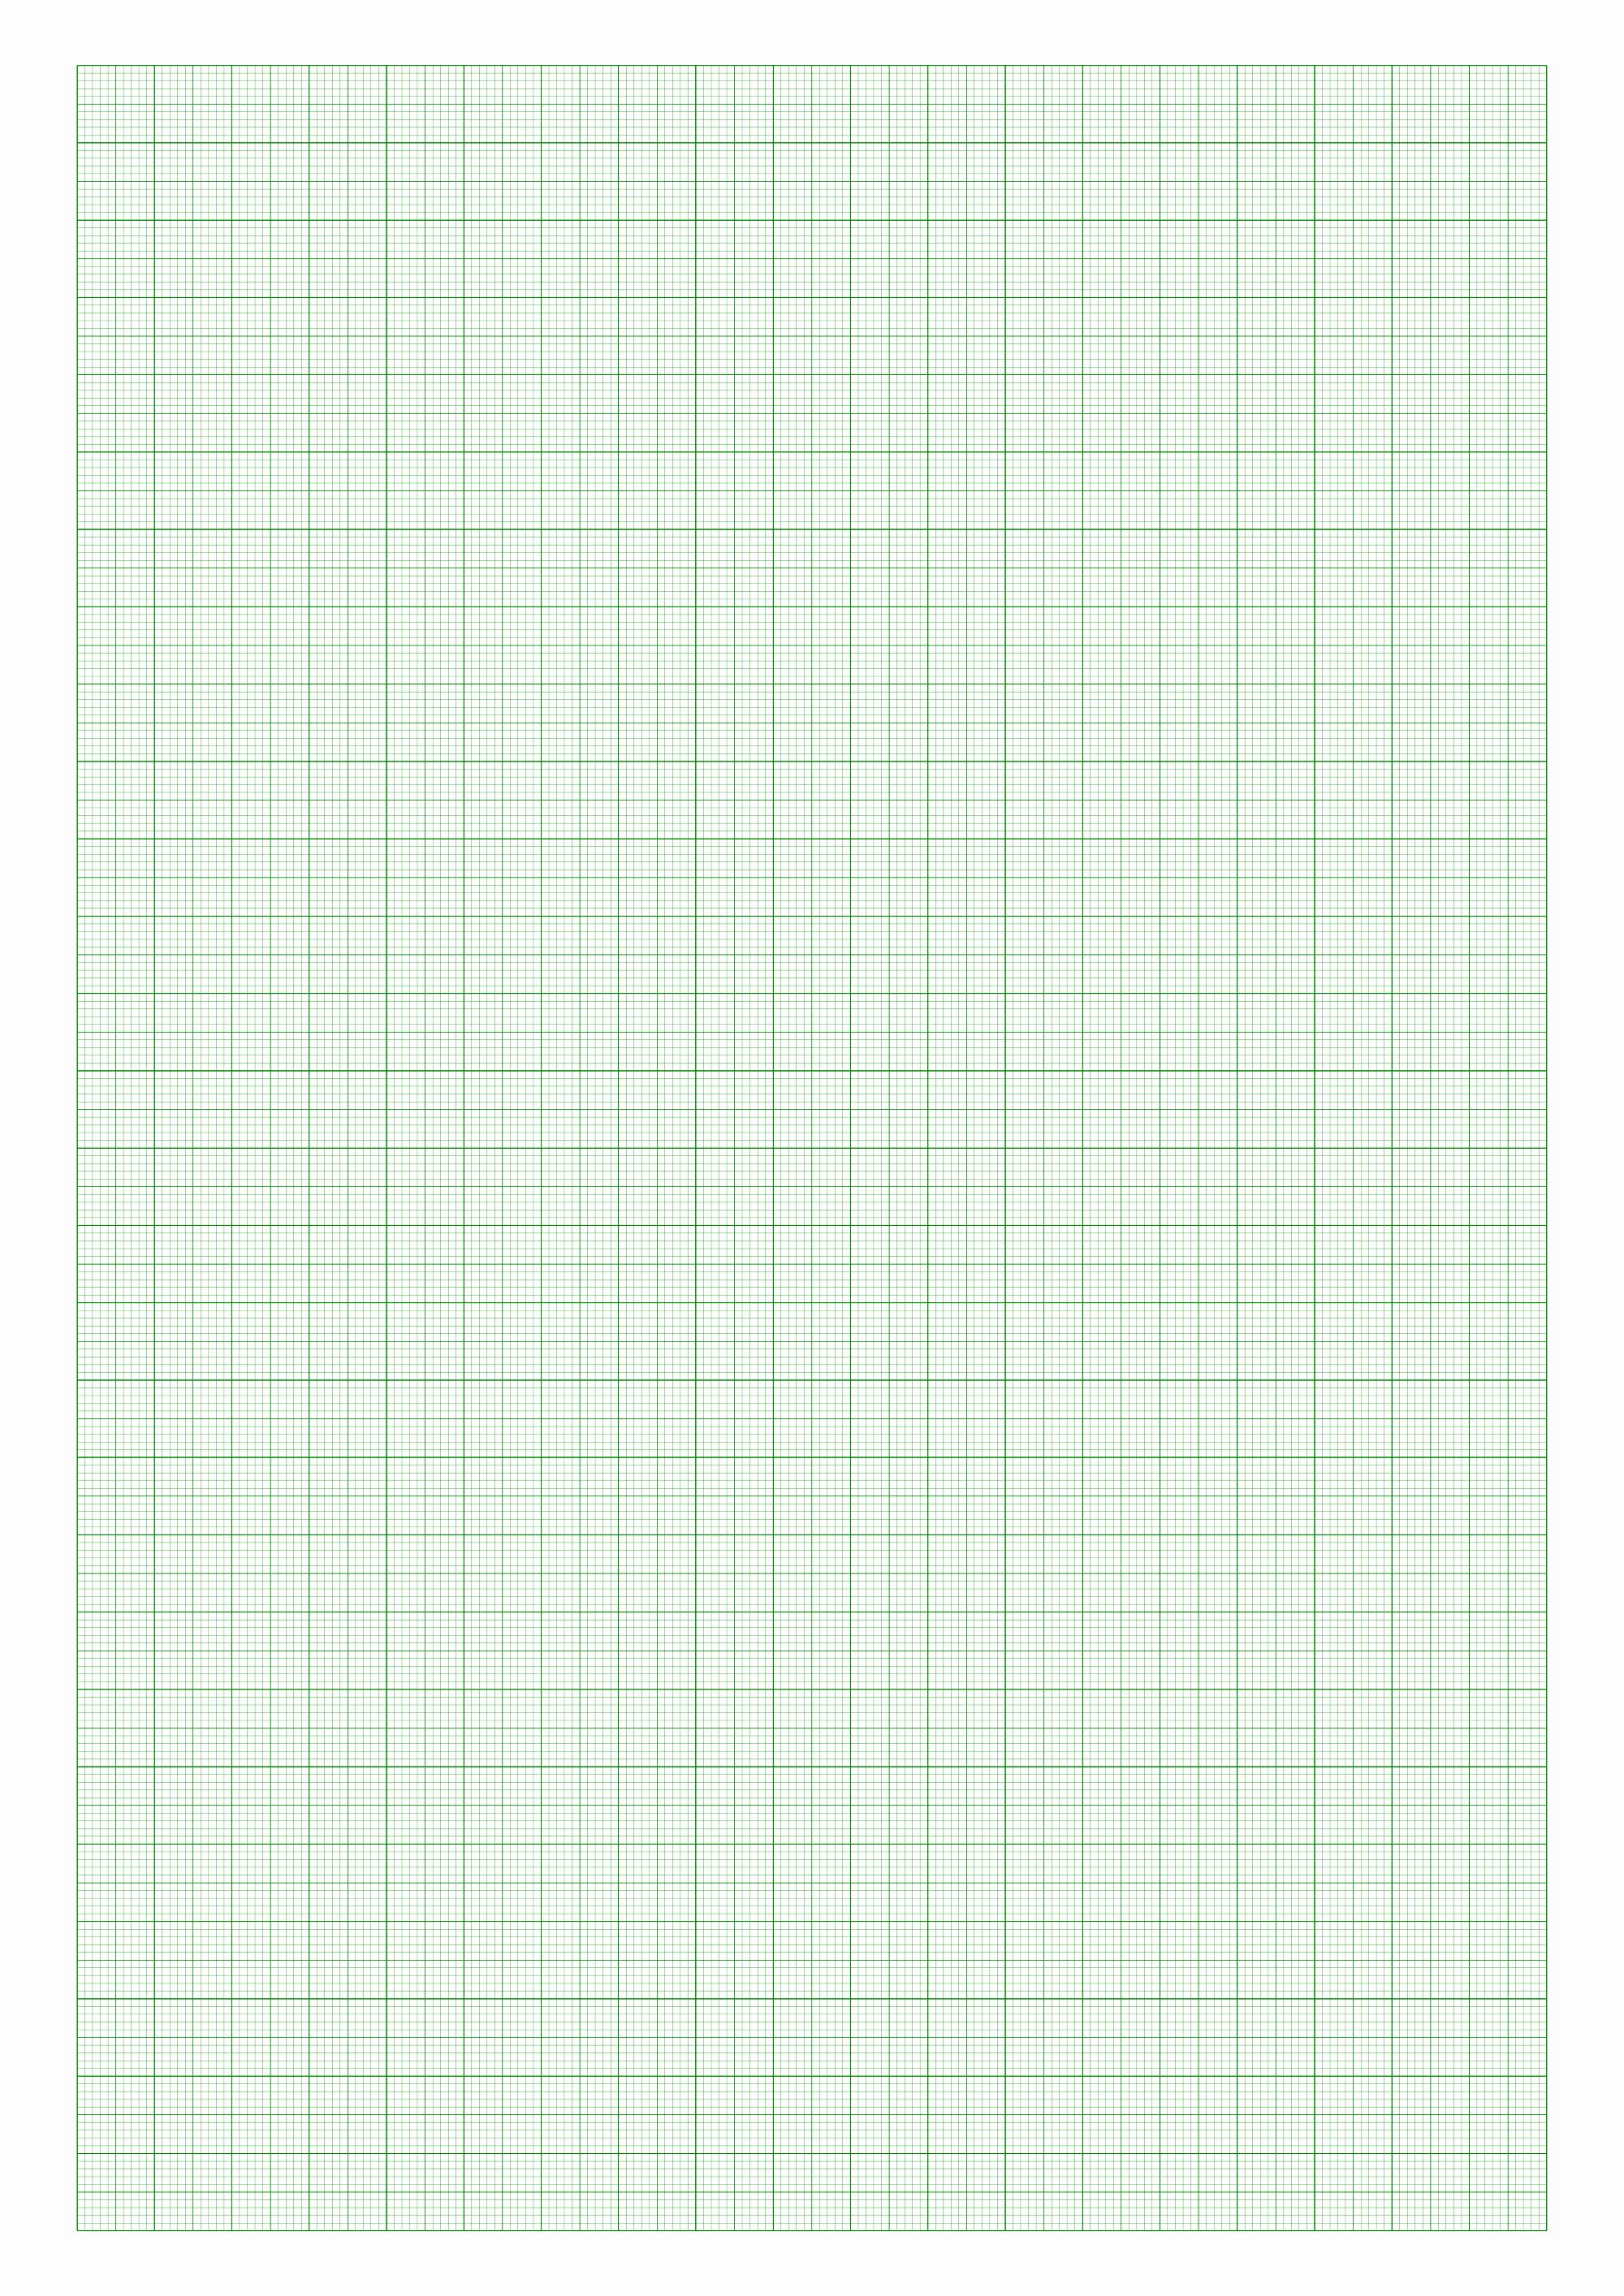 Graph Paper Template Pdf Beautiful Printable Graph Paper 1 4 – Ezzy